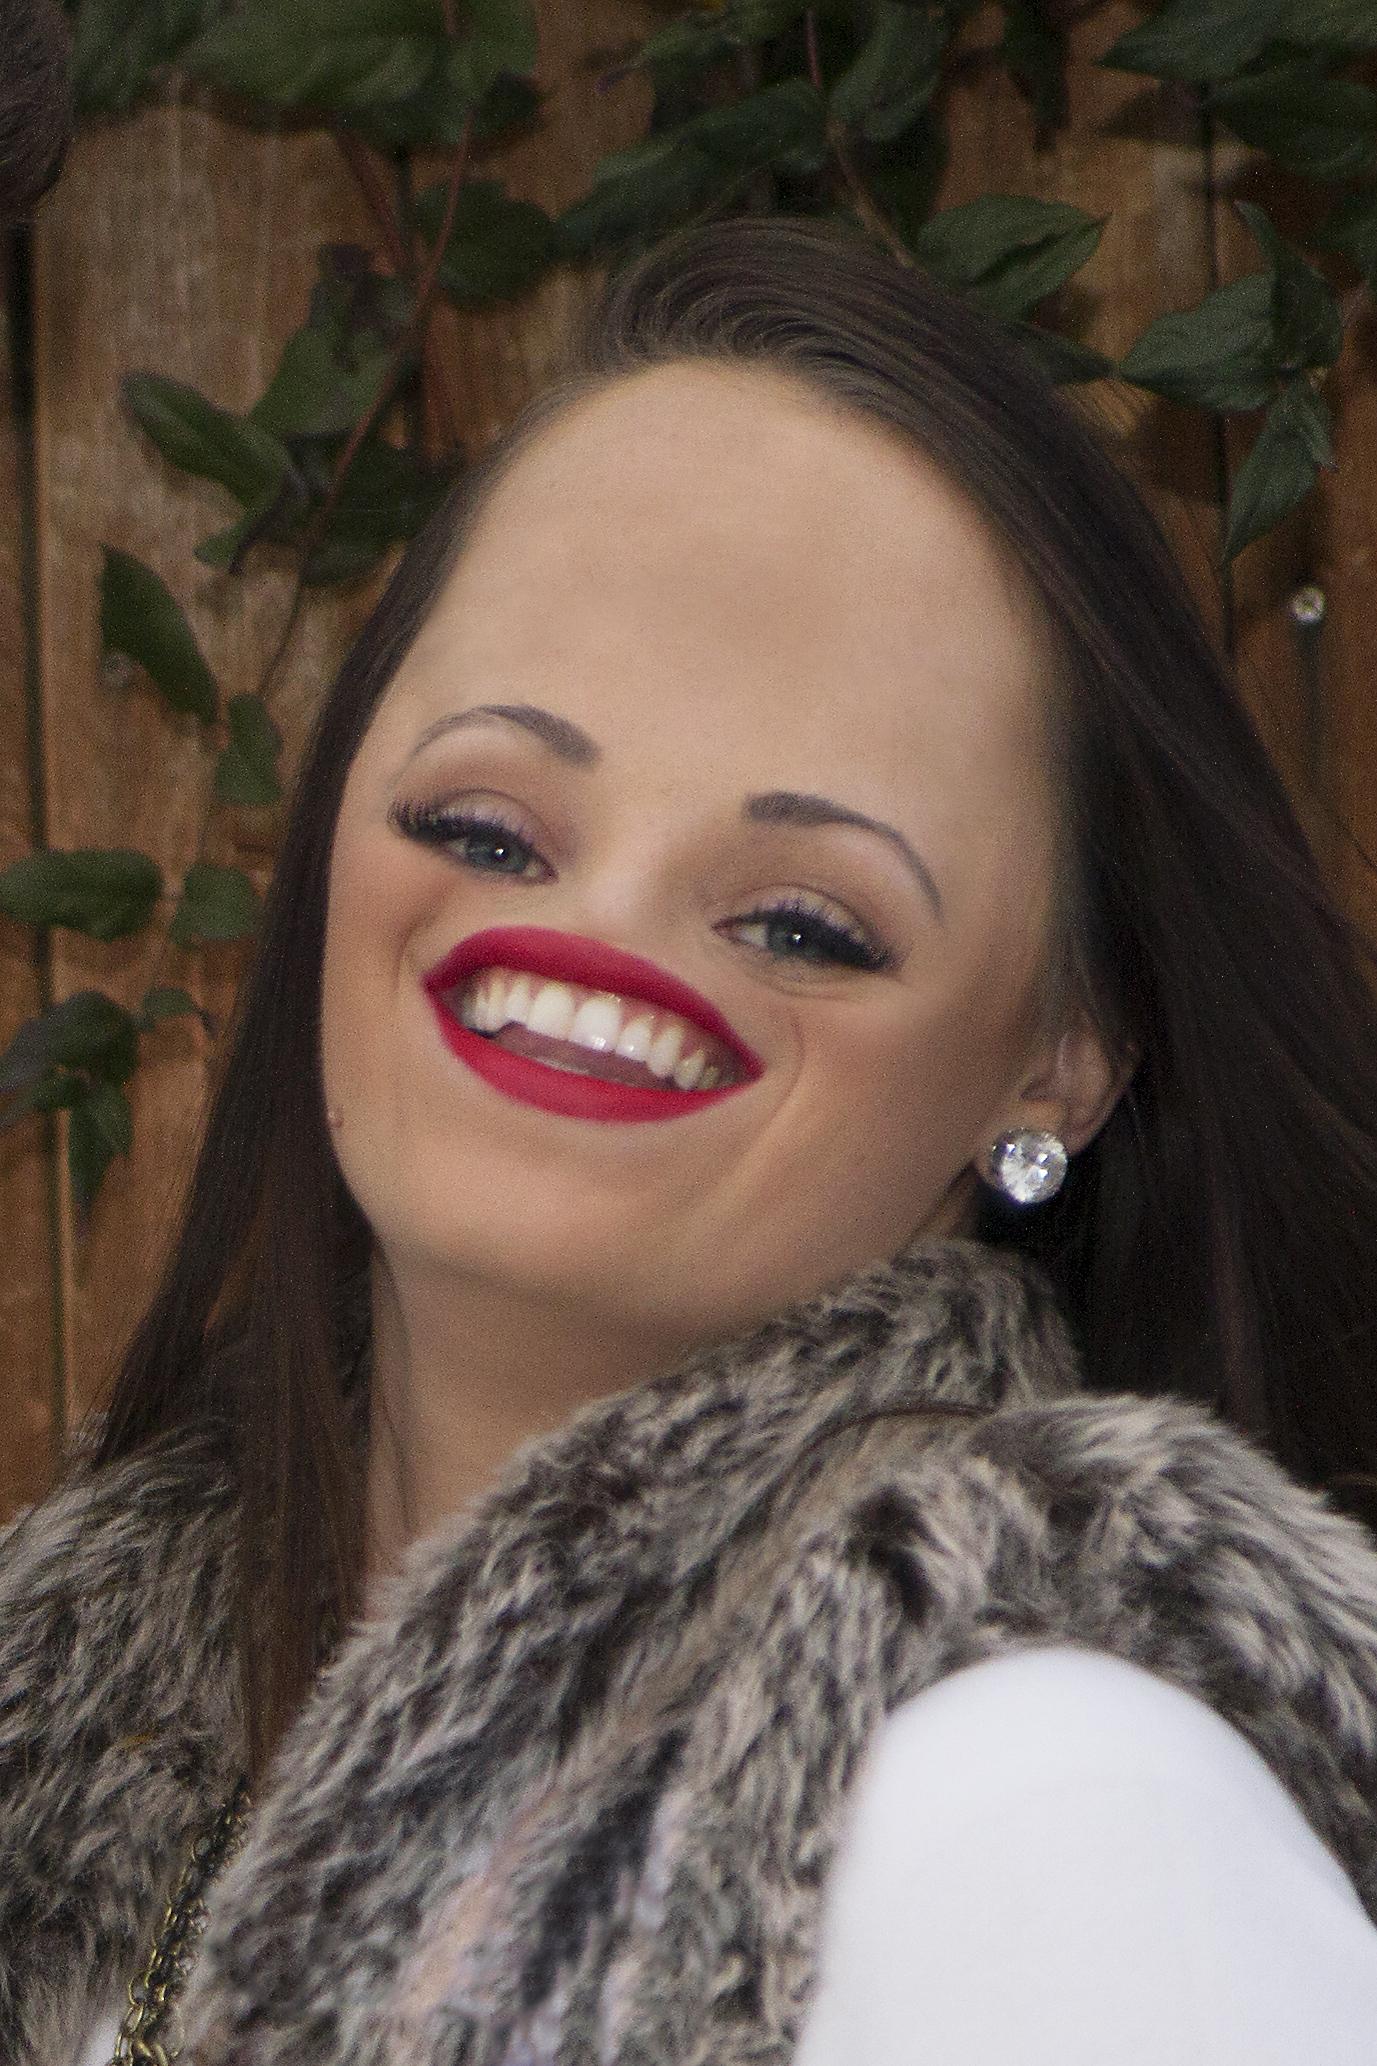 Shelby Cyr No Nose